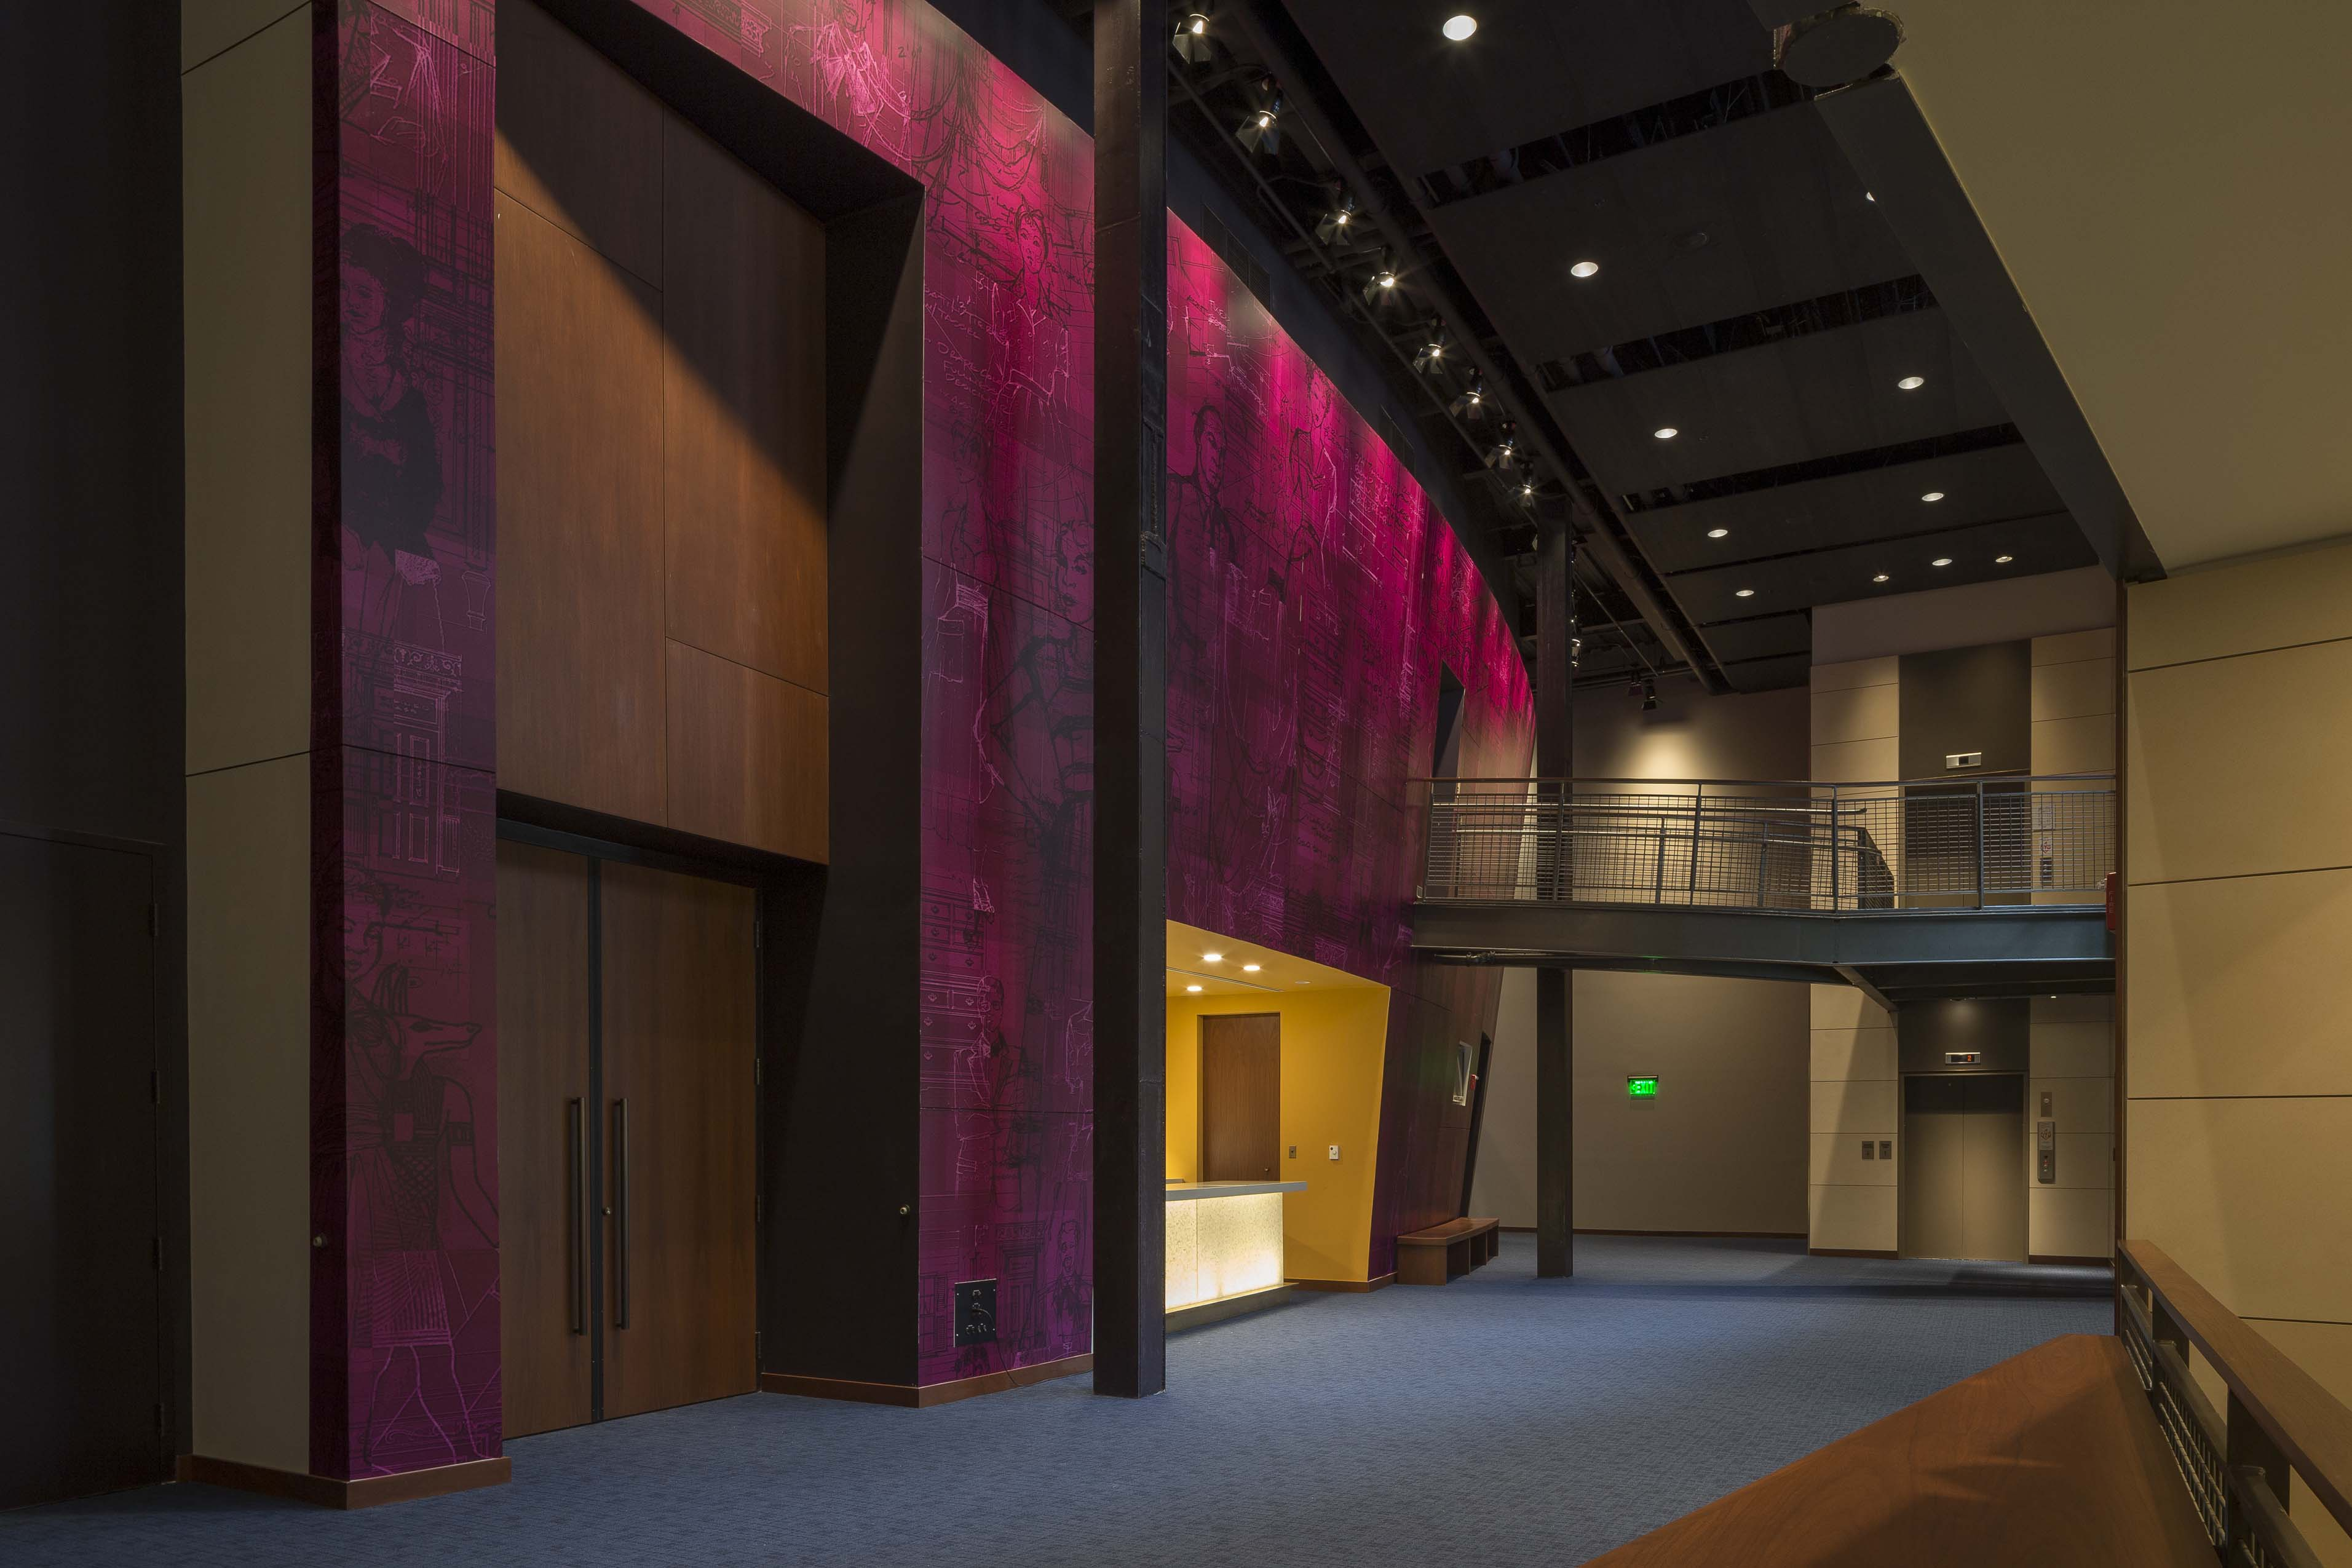 Everyman Theater Lobby Feature Wall